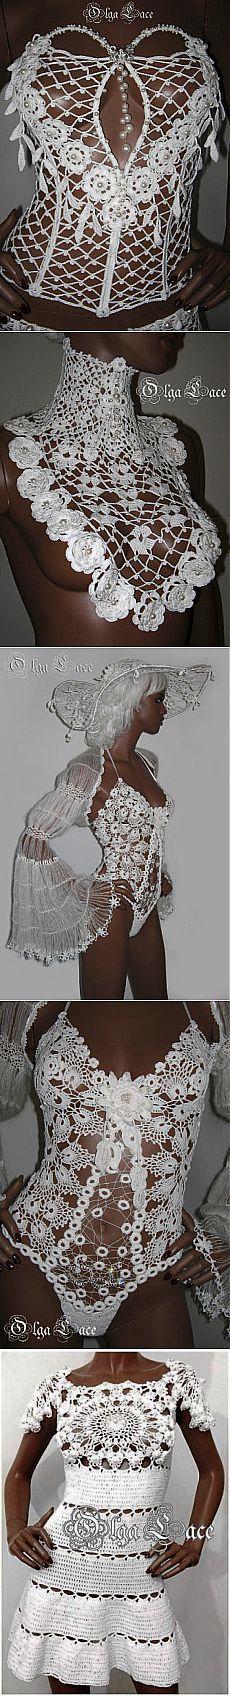 Красиво.. Freeform Crochet, Crochet Motif, Irish Crochet, Diy Crochet, Crochet Designs, Crochet Stitches, Crochet Bikini, Crochet Patterns, Crochet Scarves